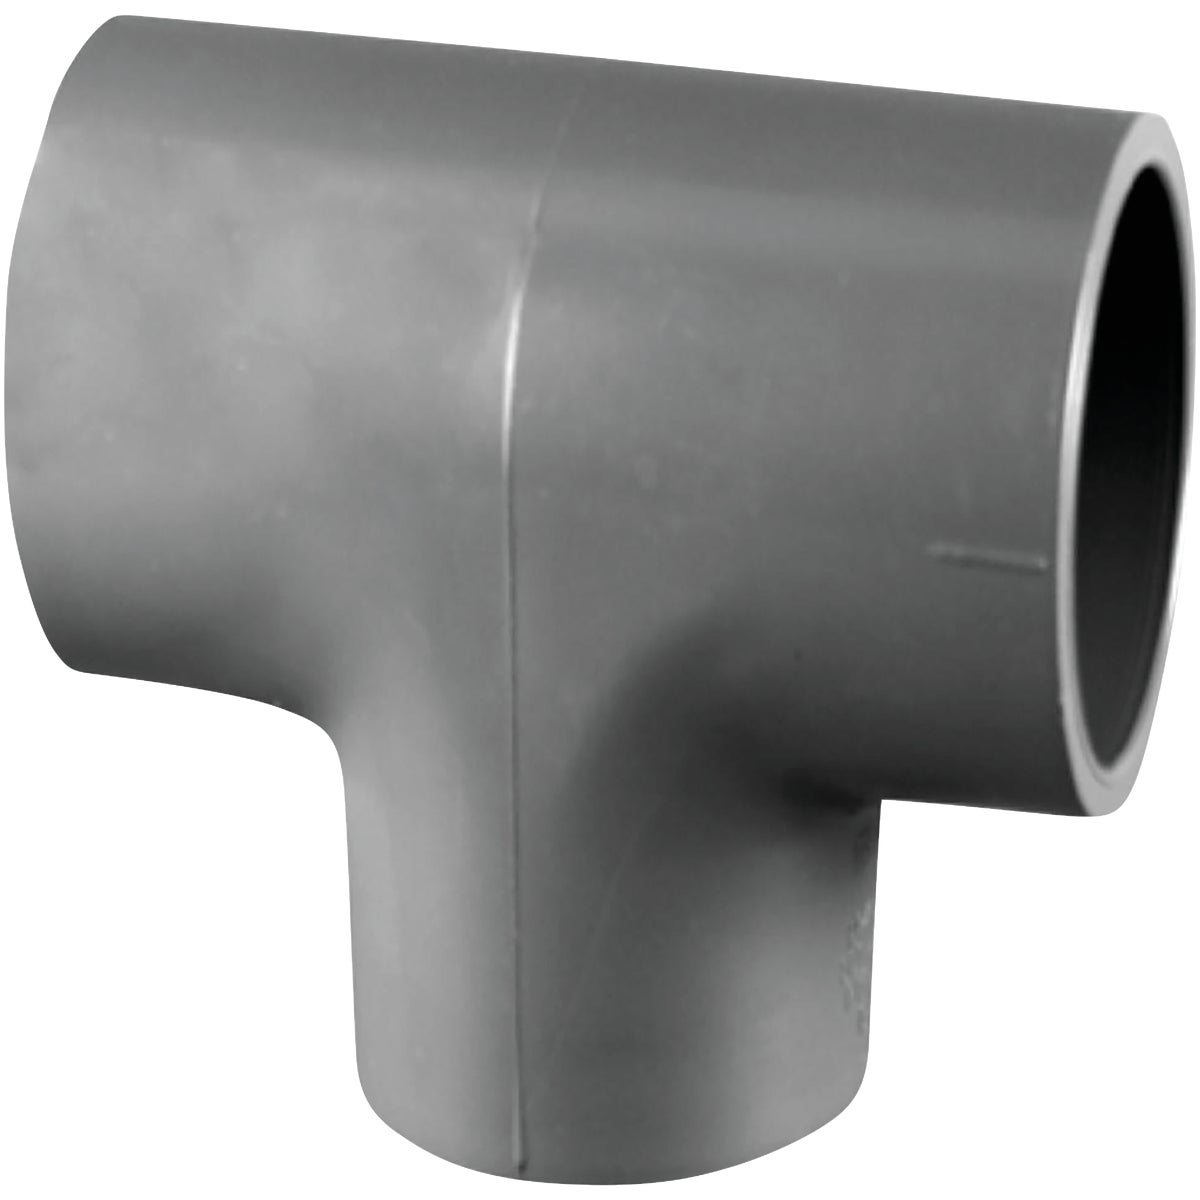 "1-1/4"" SCH80 PVC TEE - 314148 by Genova Inc"